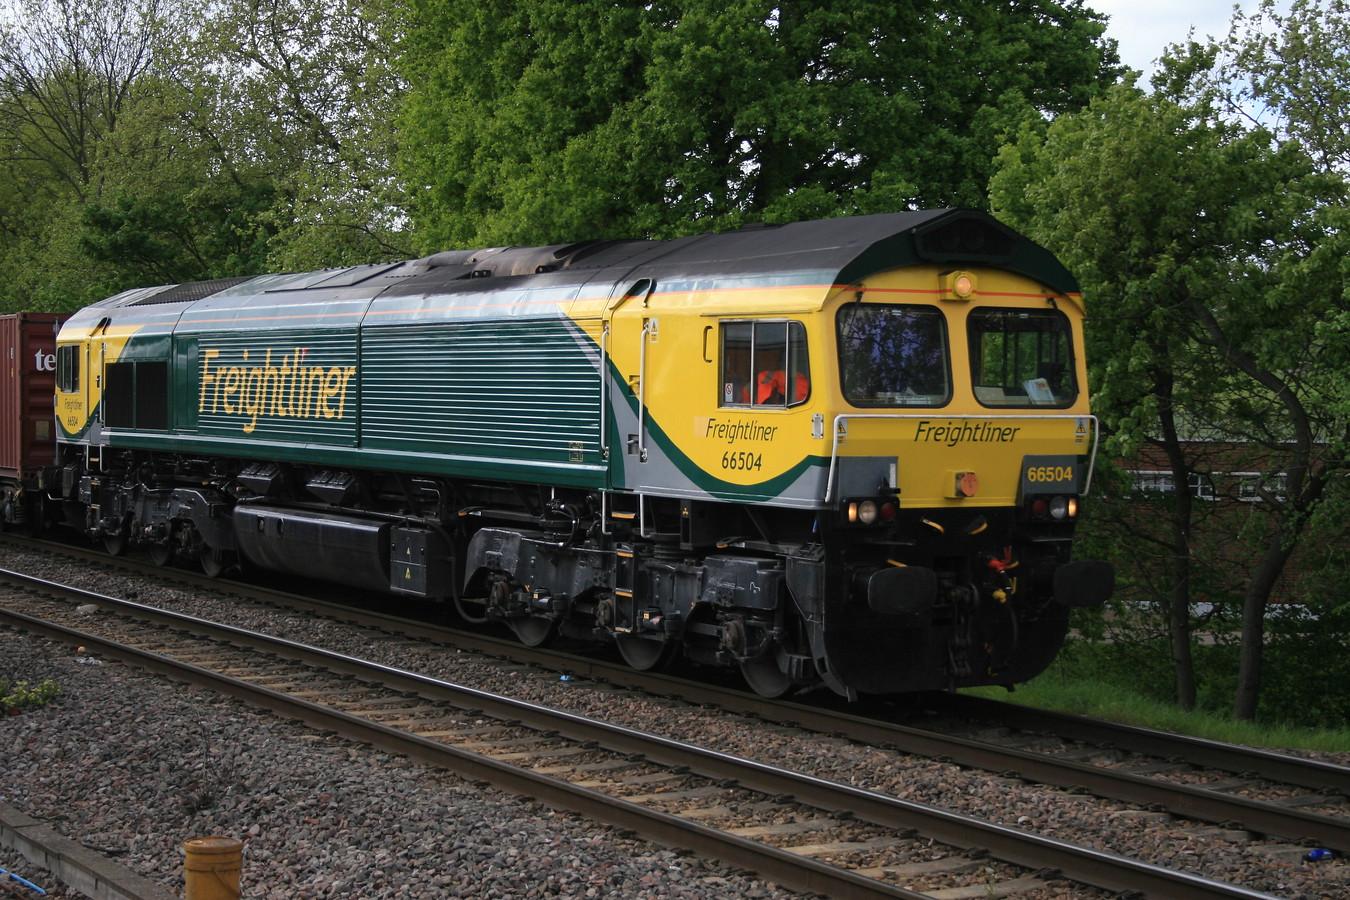 66504_GospelOak_05052015 (28)_freightliner